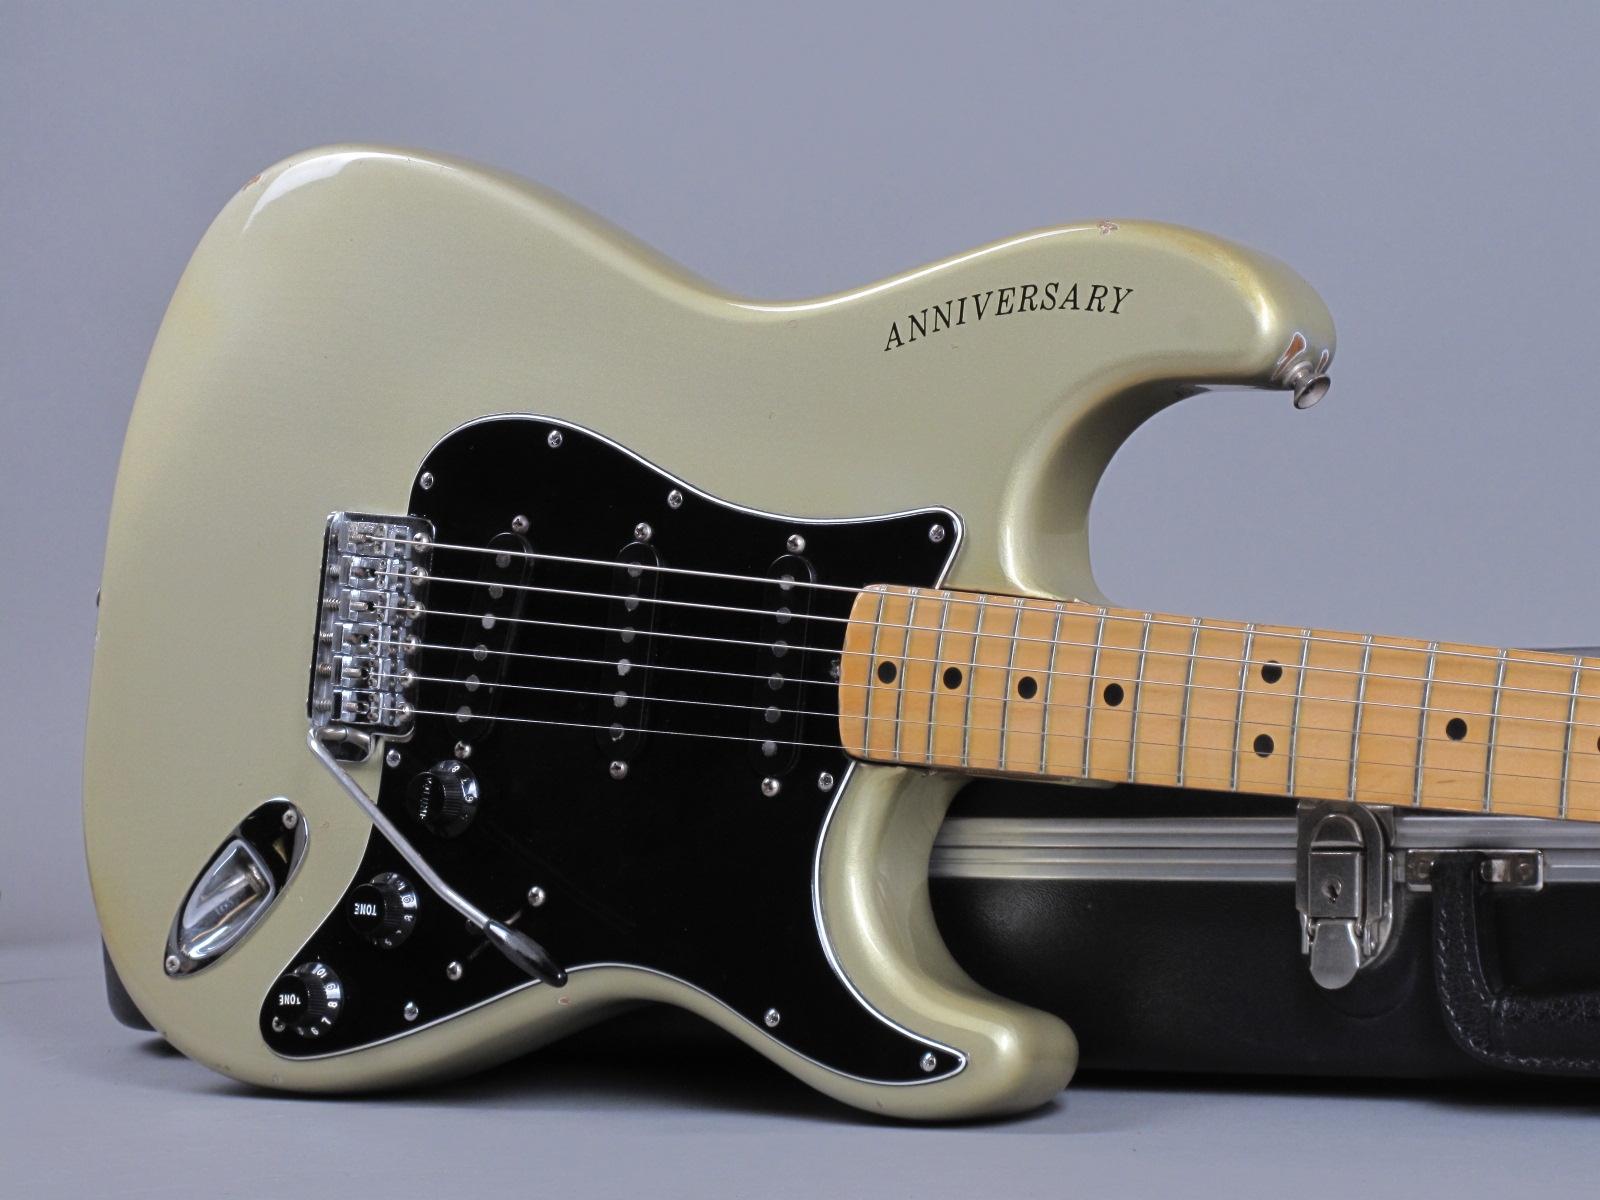 https://guitarpoint.de/app/uploads/products/1979-fender-stratocaster-1954-1979-25th-anniversary/1979-Fender-Stratocaster-25th-Anniversary-Silver-257573_19.jpg